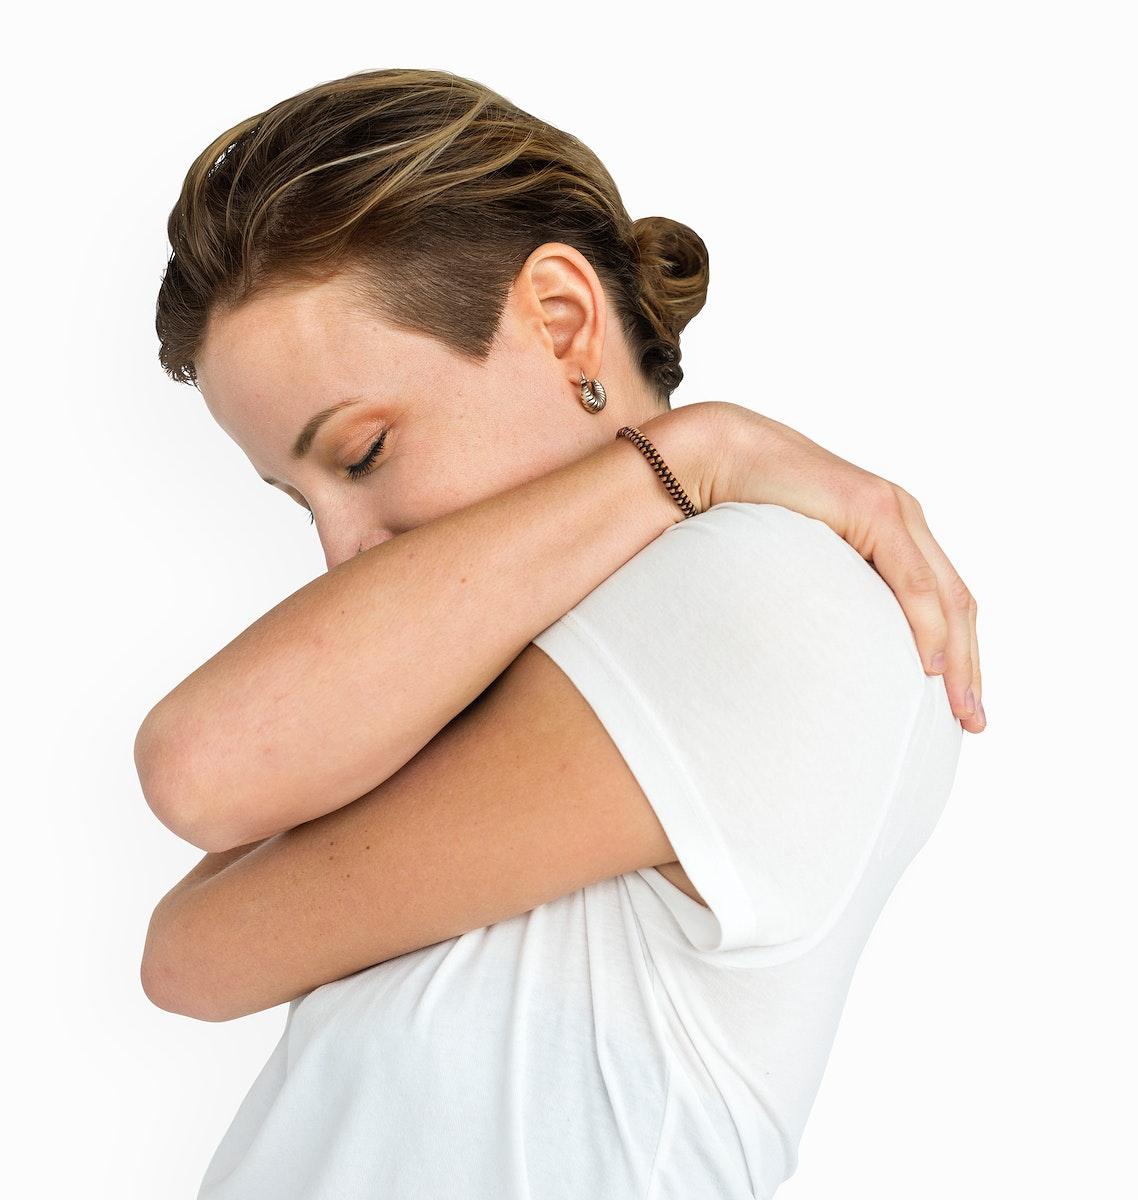 Caucasian Lady Lonely Hug Concept